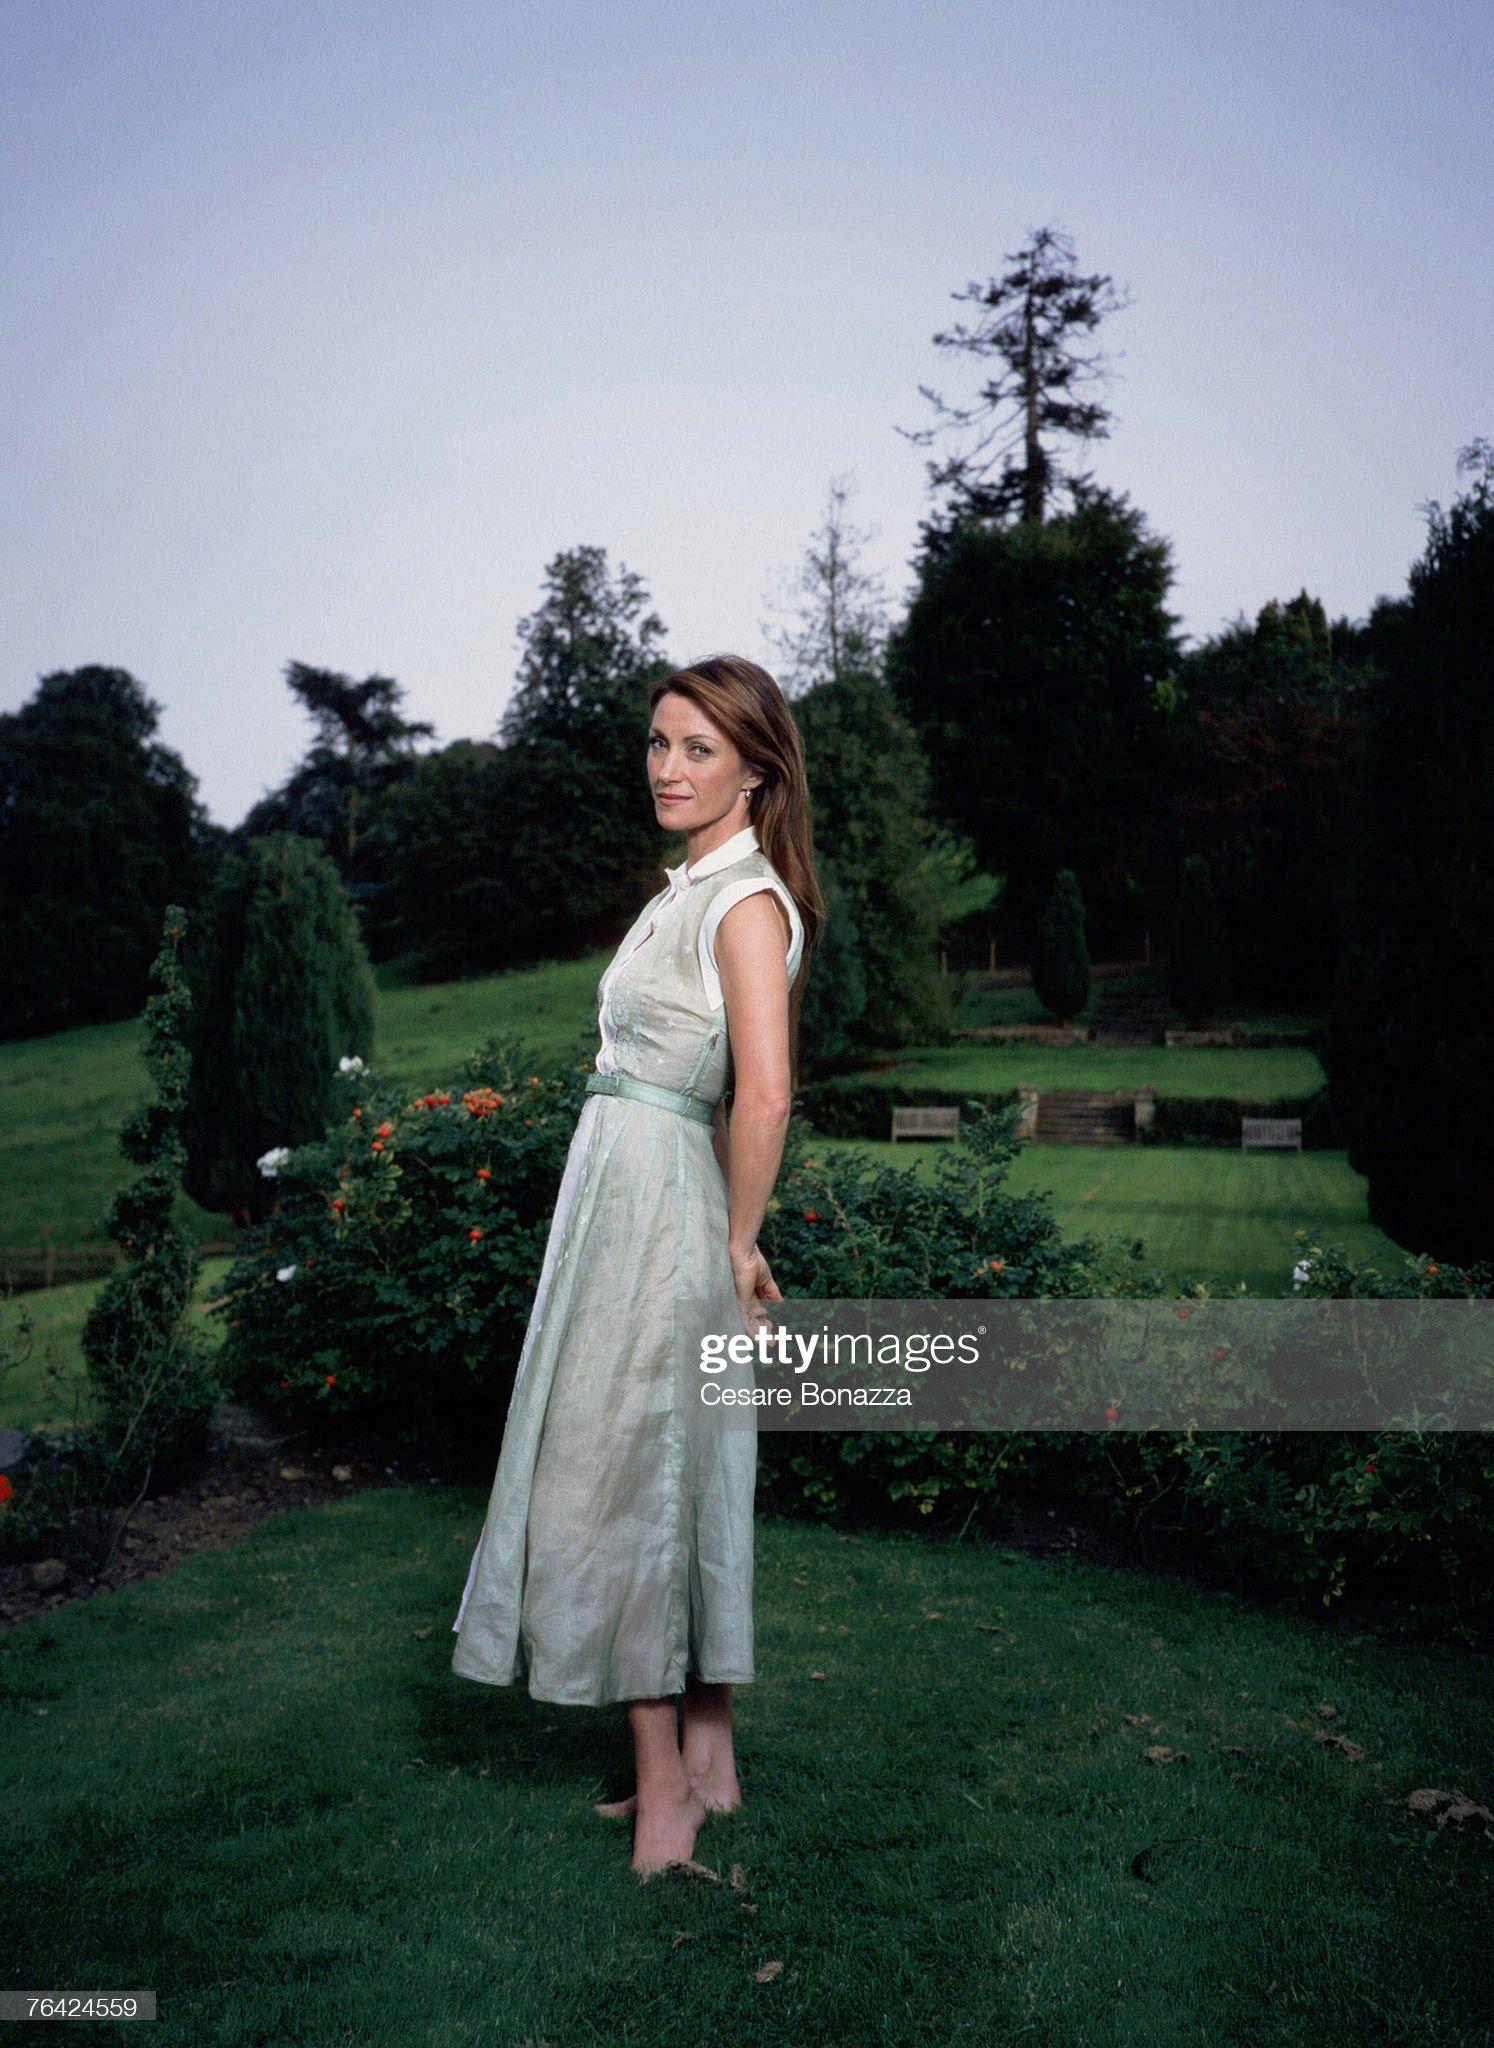 https://media.gettyimages.com/photos/jane-seymour-jane-seymour-photo-shoot-in-bath-england-bath-england-picture-id76424559?s=2048x2048